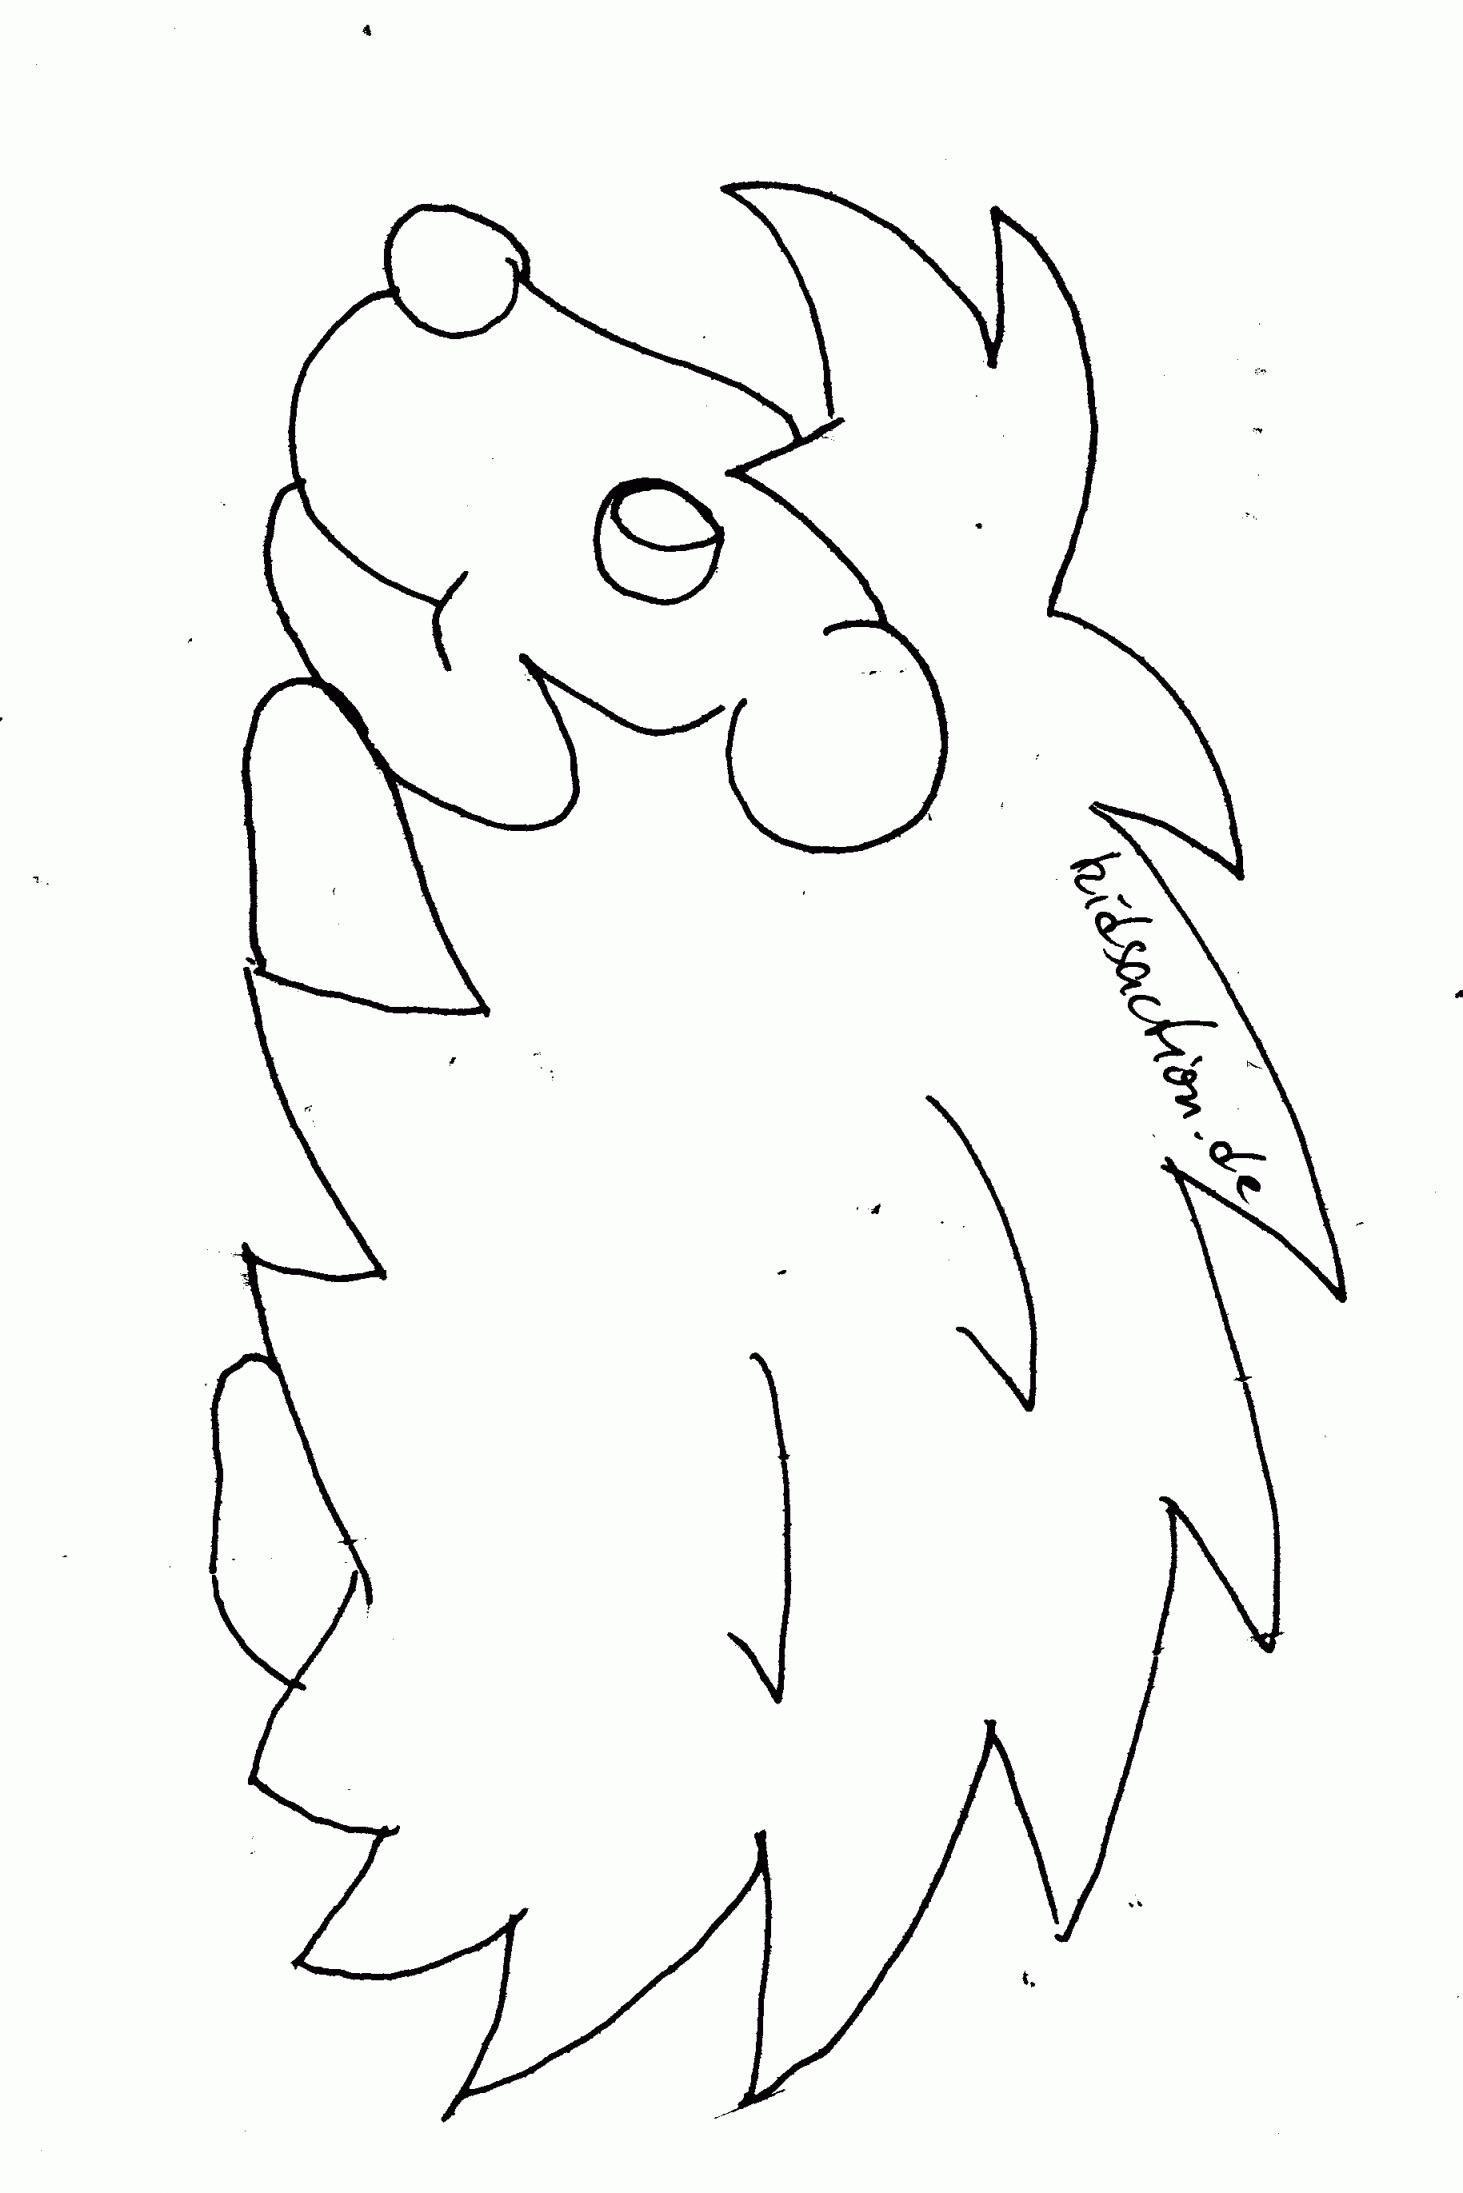 My Little Pony Ausmalbilder Kostenlos Inspirierend Malvorlagen Igel Elegant Igel Grundschule 0d Archives Uploadertalk Stock